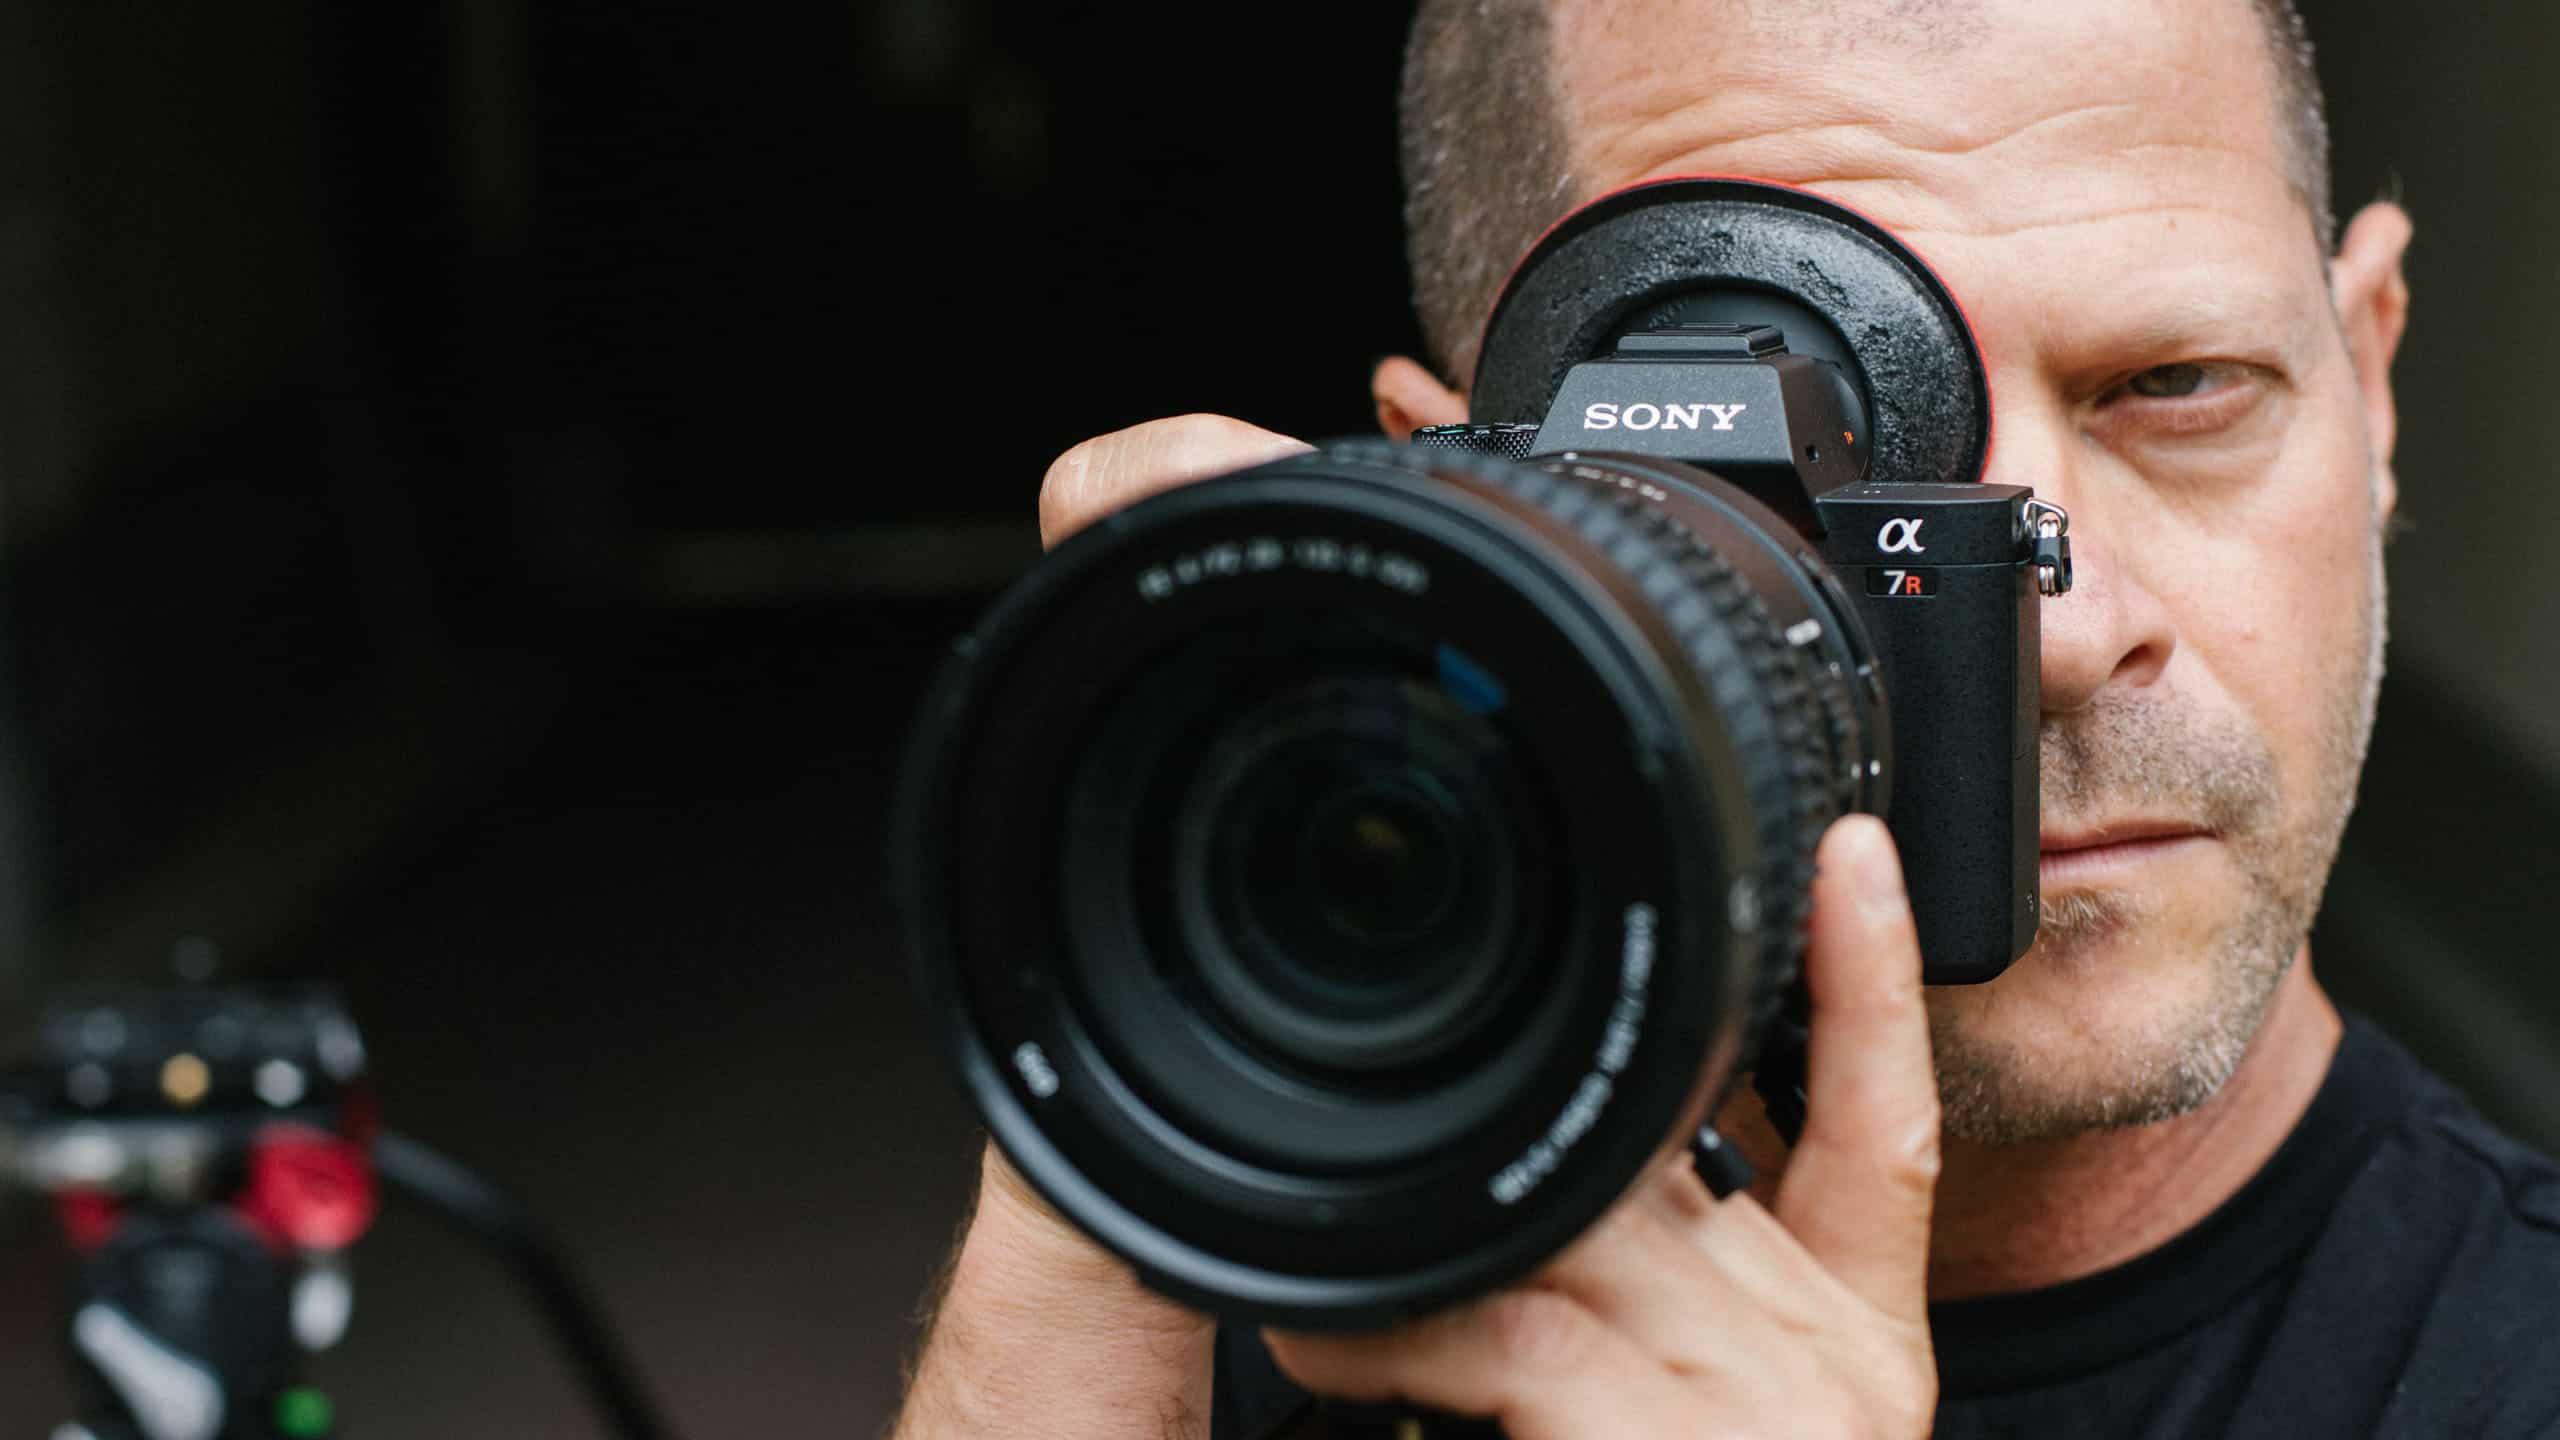 Sony a7RII Amateur Camera